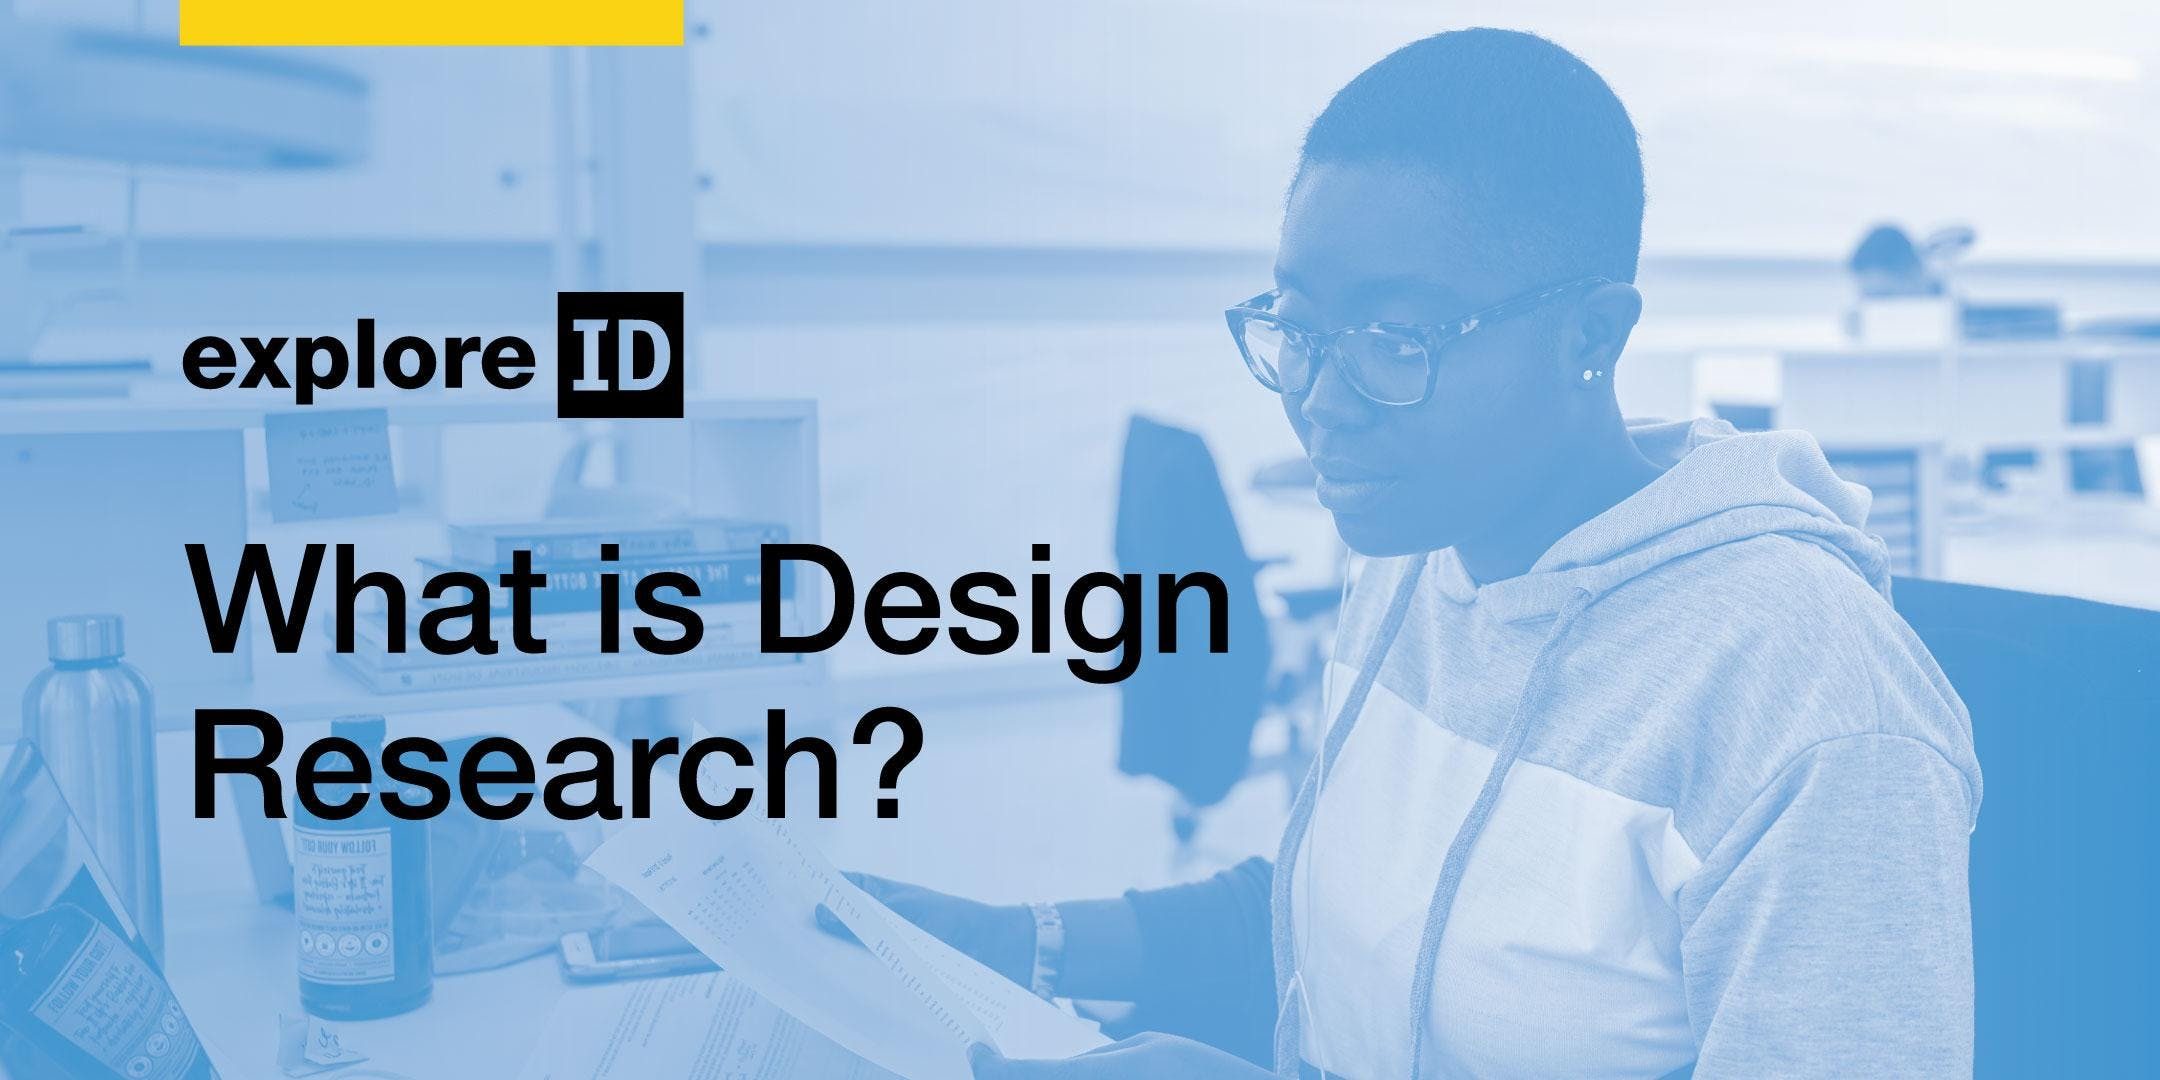 exploreID: What is Design Research?